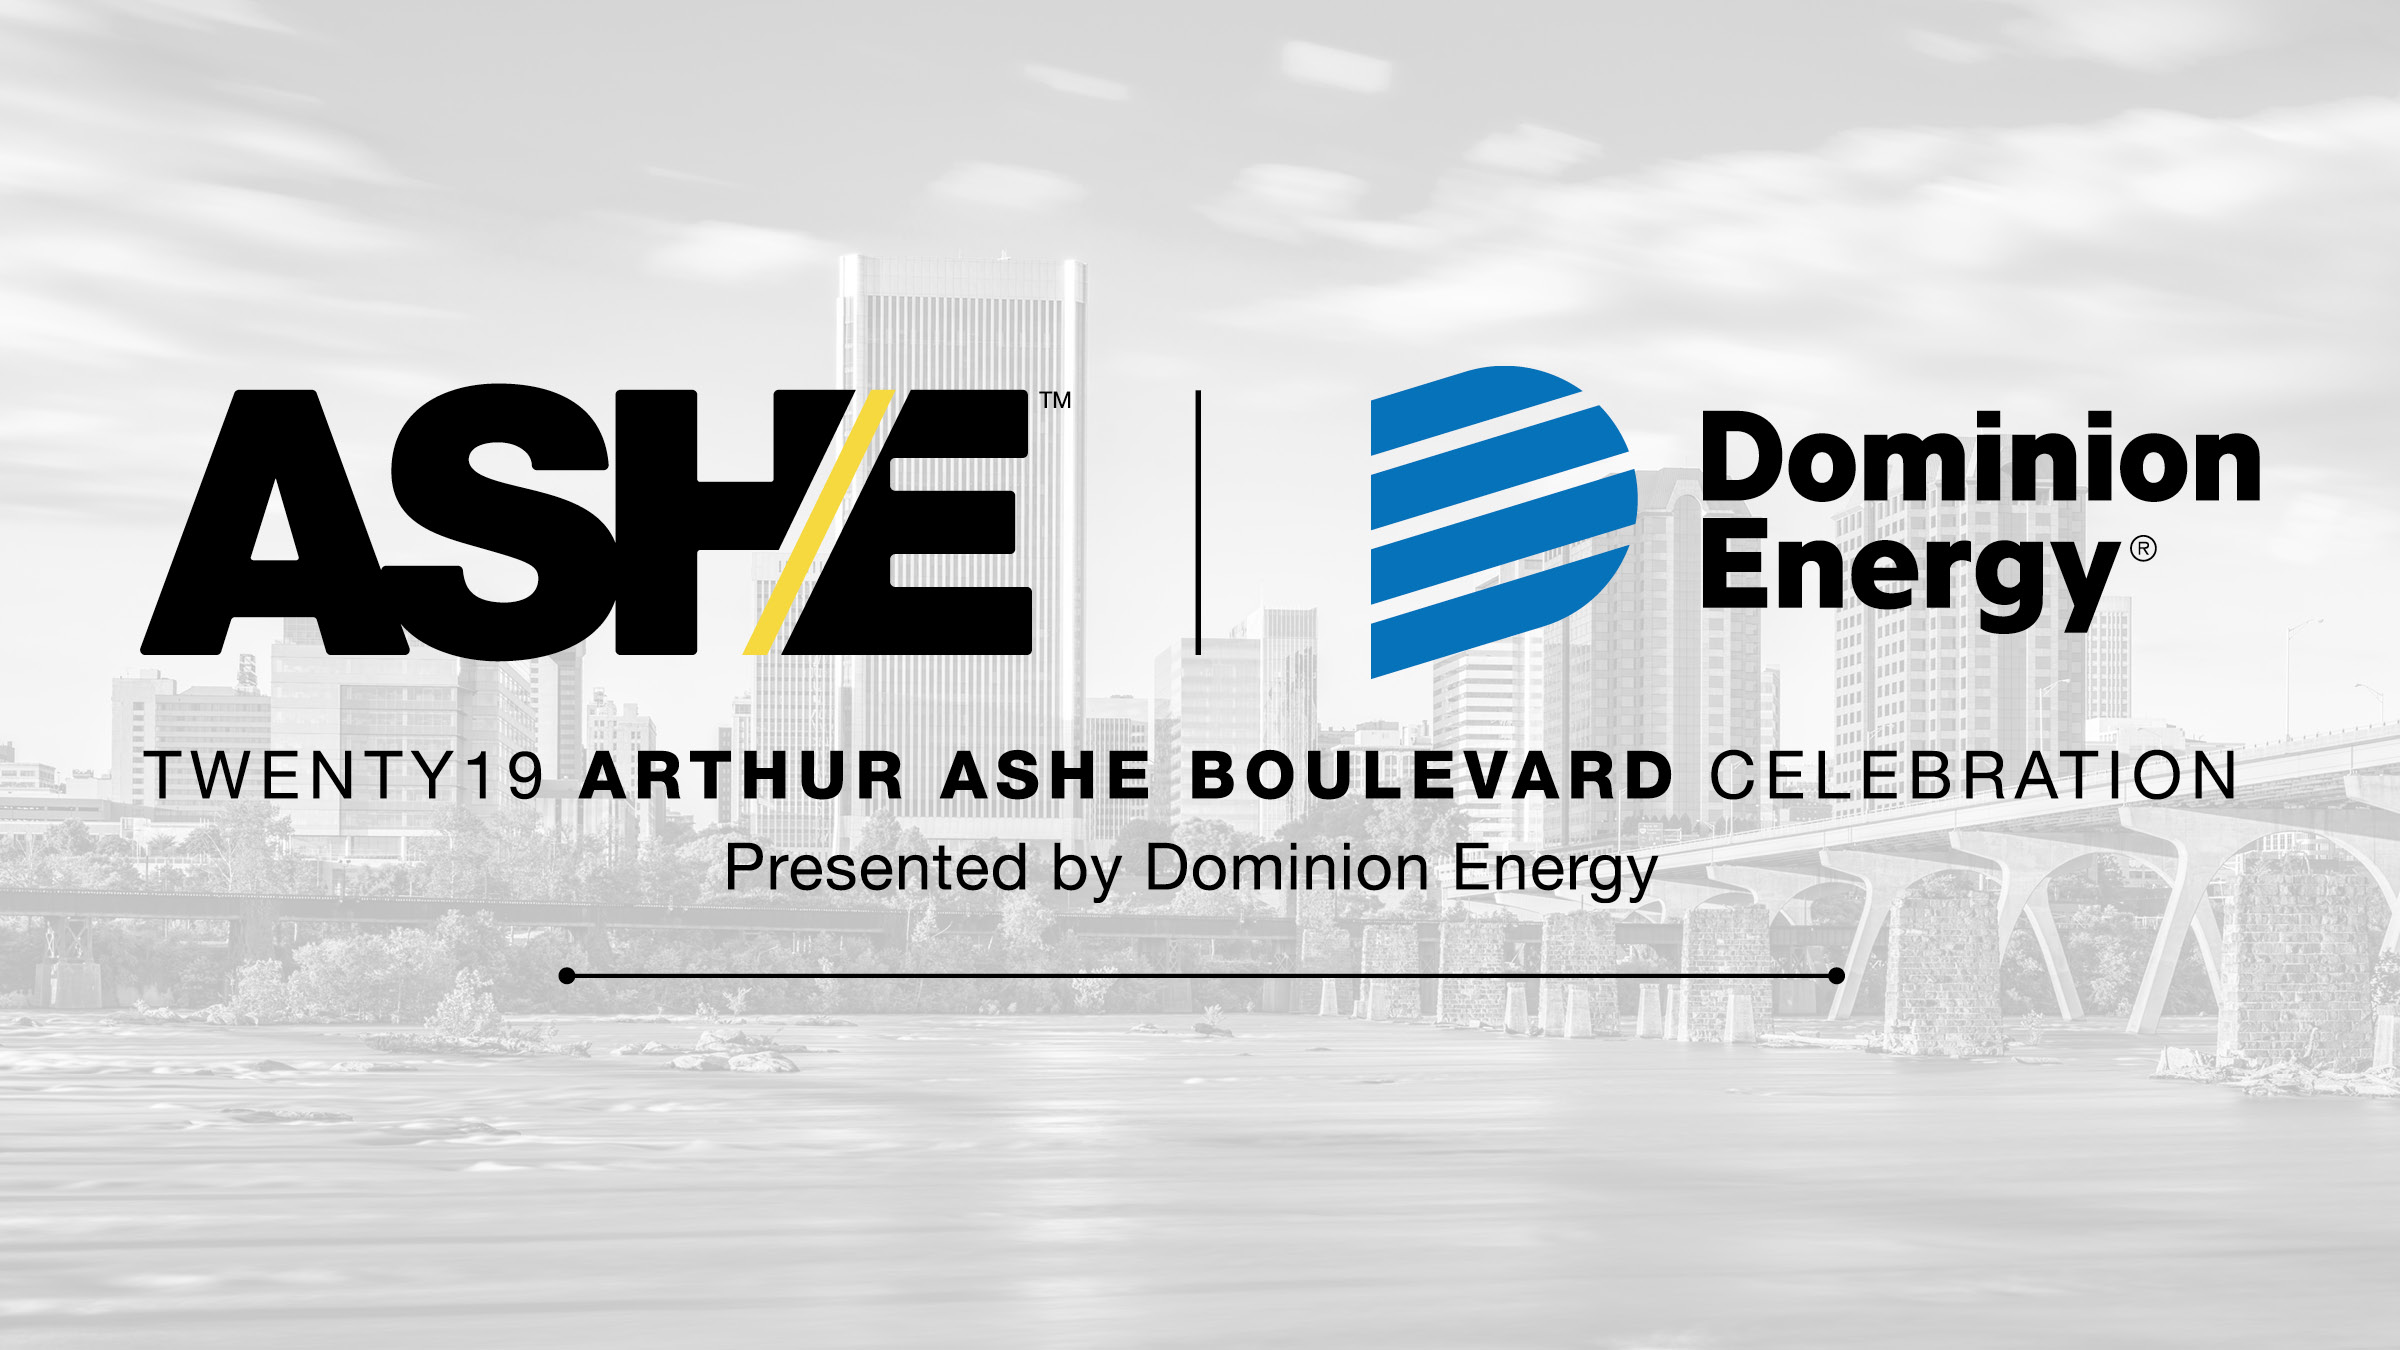 ASHE18015_Dominion_Energy_1200x675_FINAL2.jpg